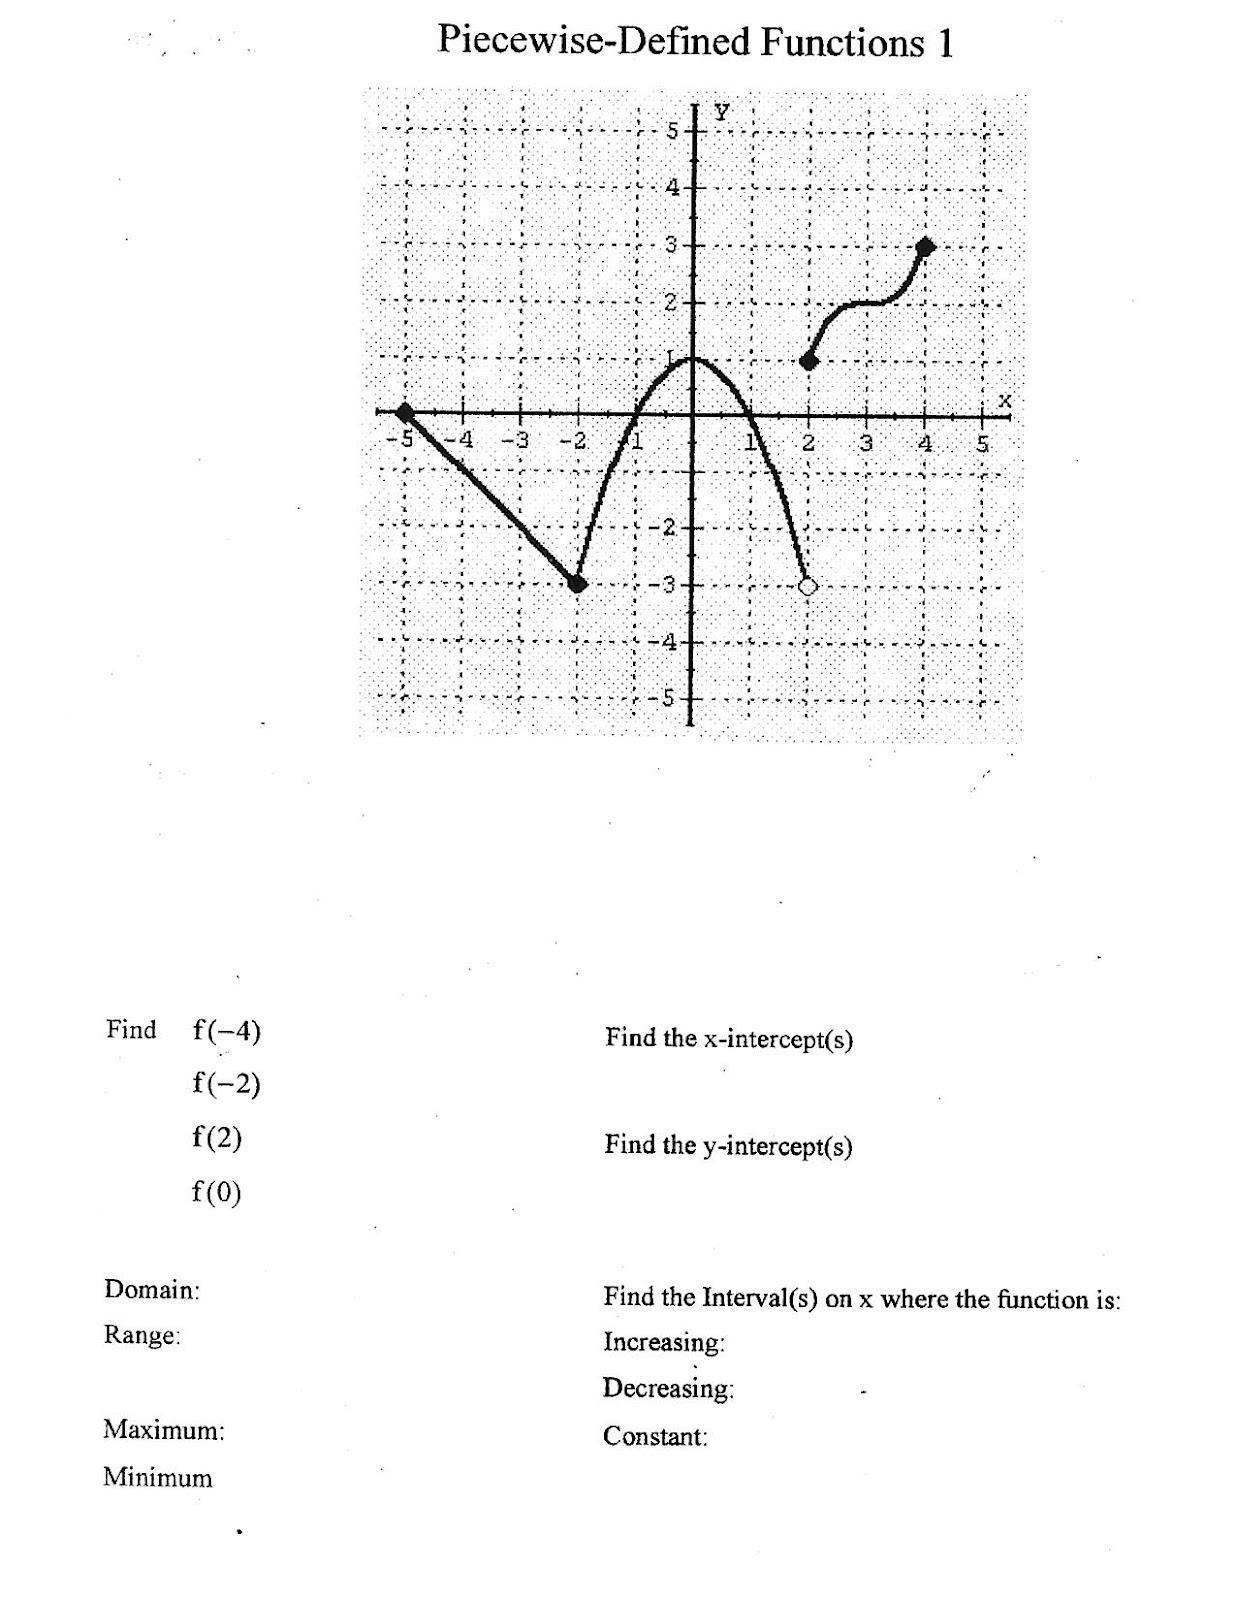 Mr. Suominen's Math Homepage: September 2012